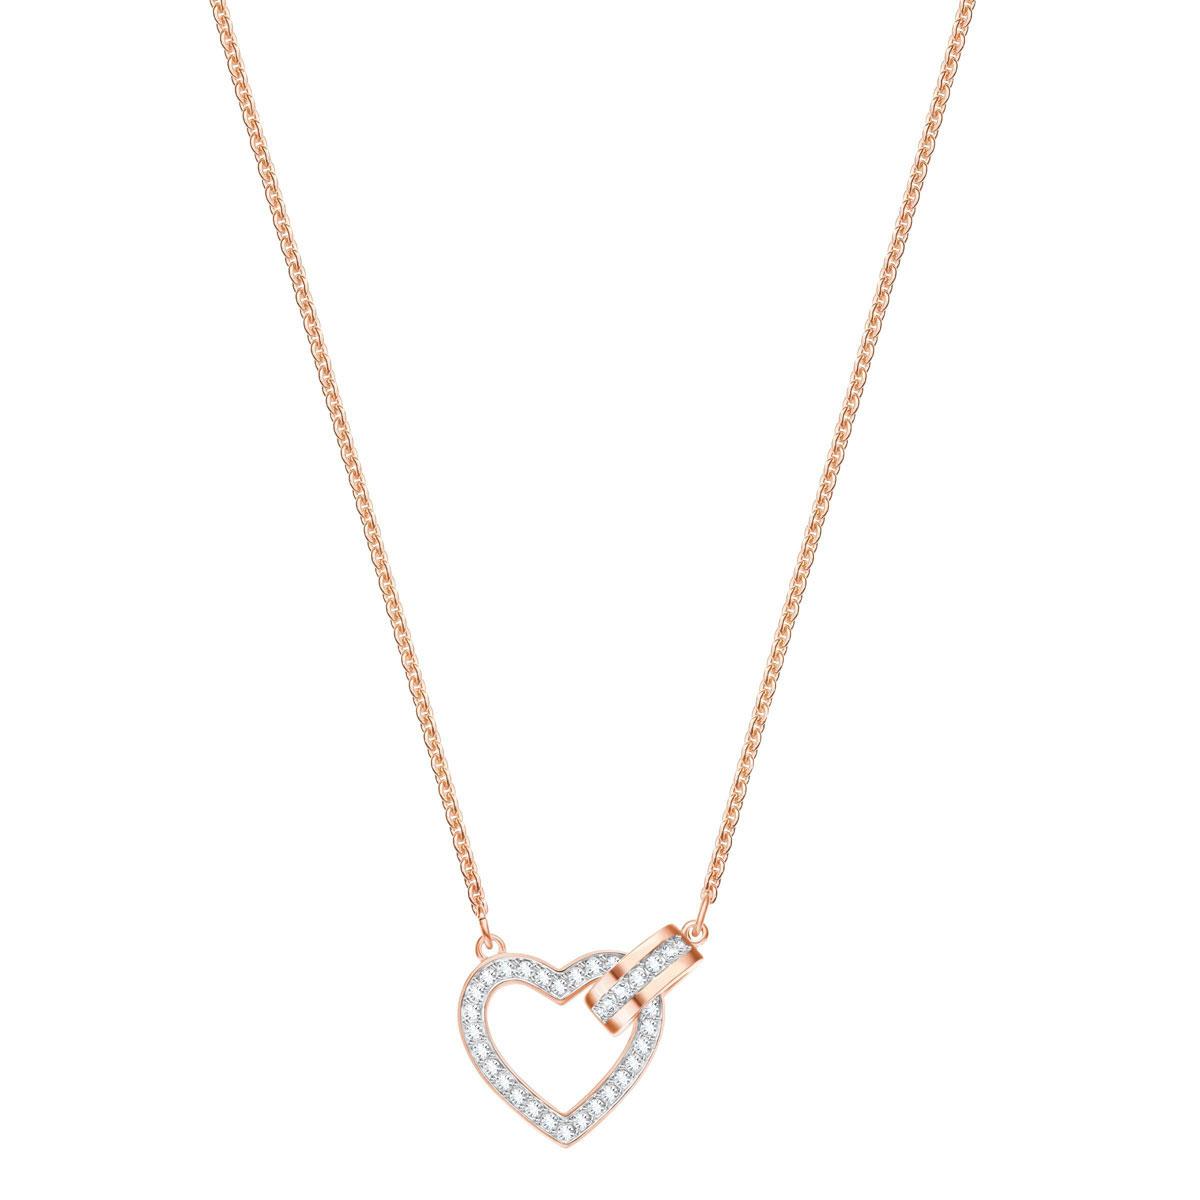 Swarovski Lovely Necklace, White, Rose Gold